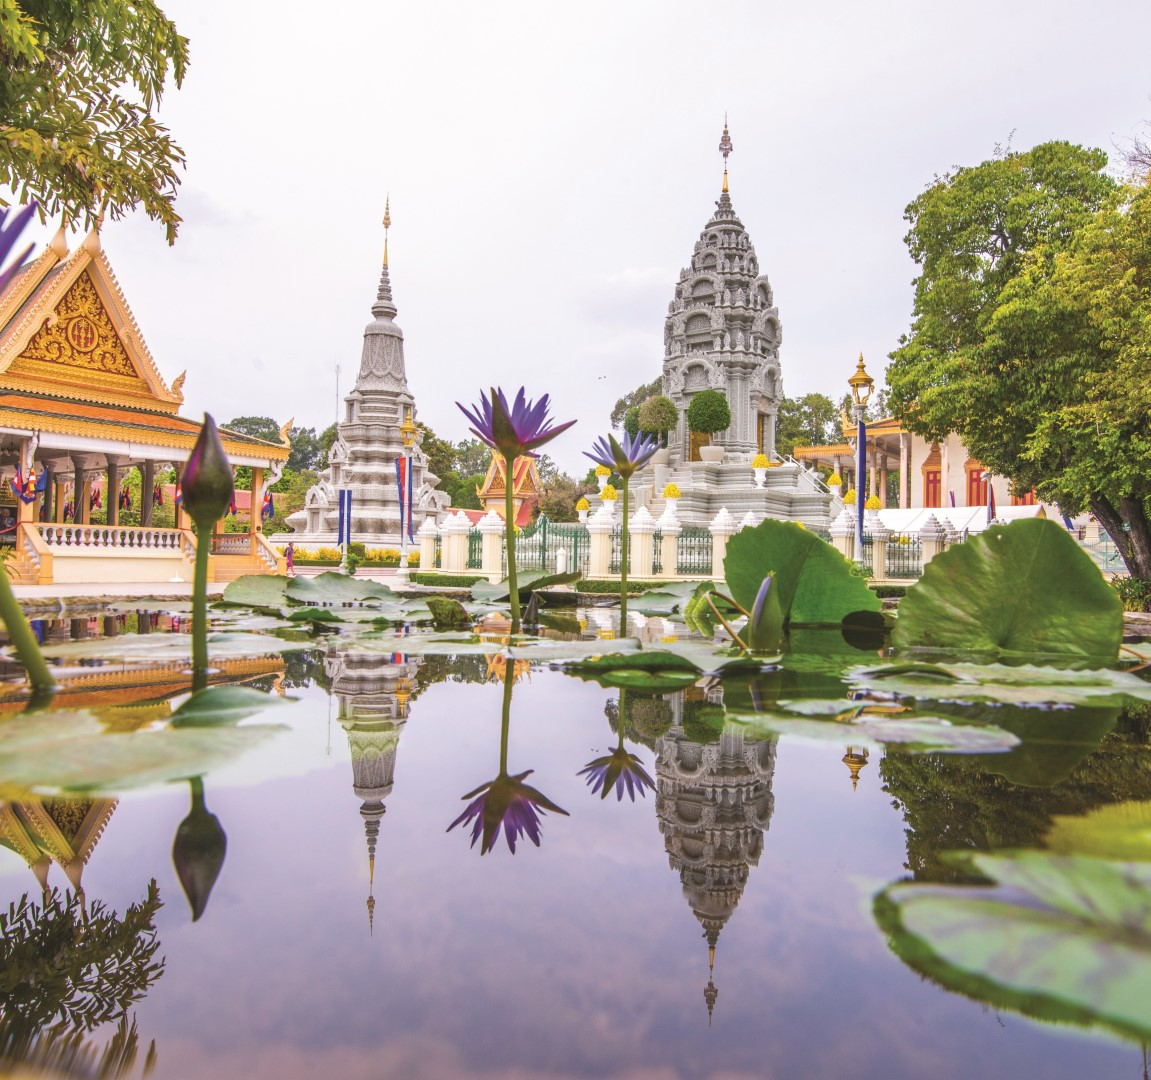 Phnomenal Art - Phnom Penh